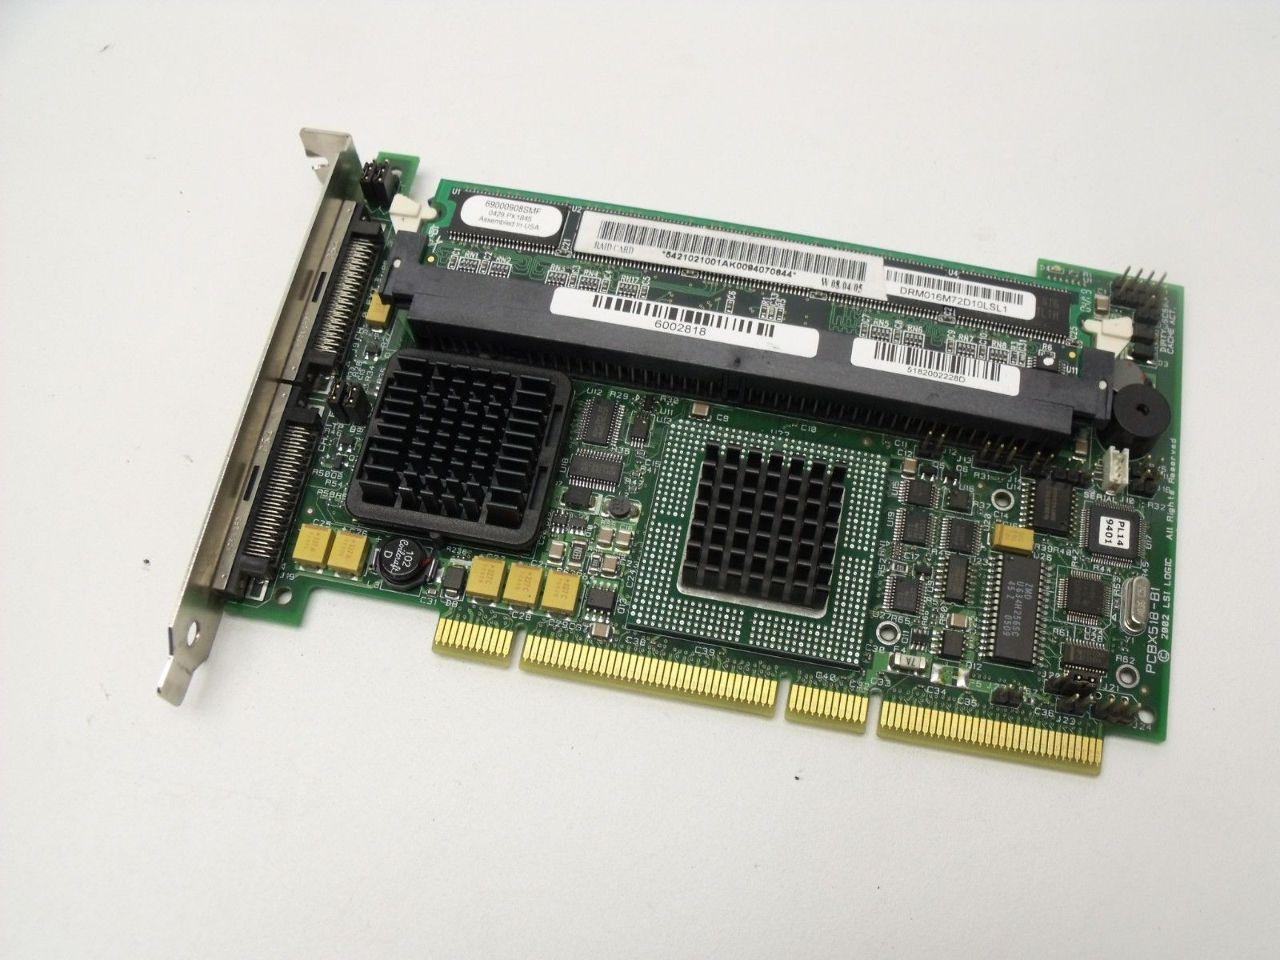 LSI MegaRAID SCSI 320-2 RAID Controller Series 518 Hardware Manual